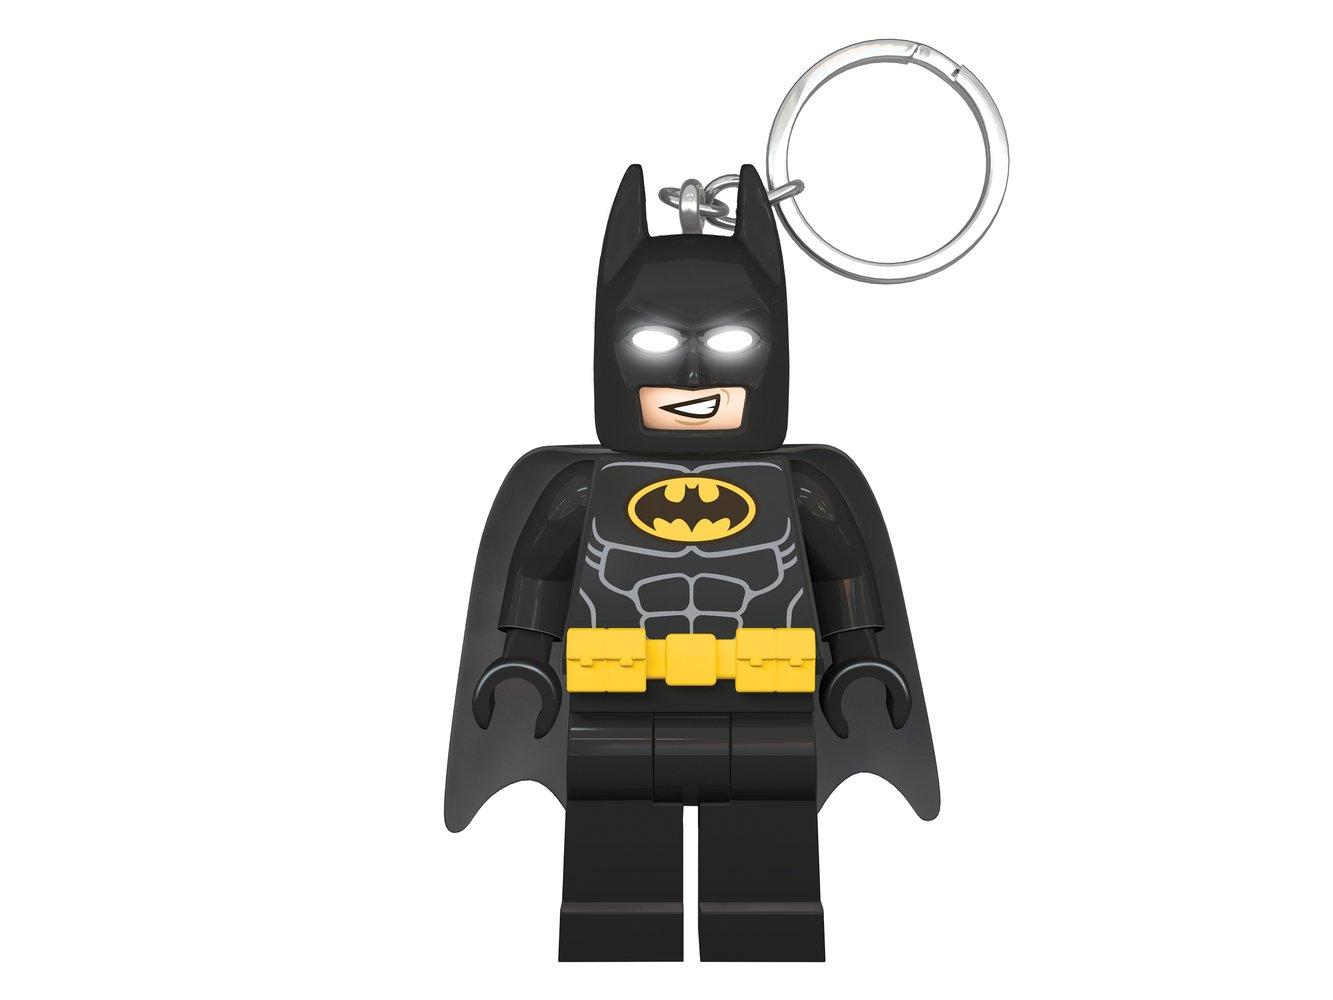 Batman Minifigure Key Light